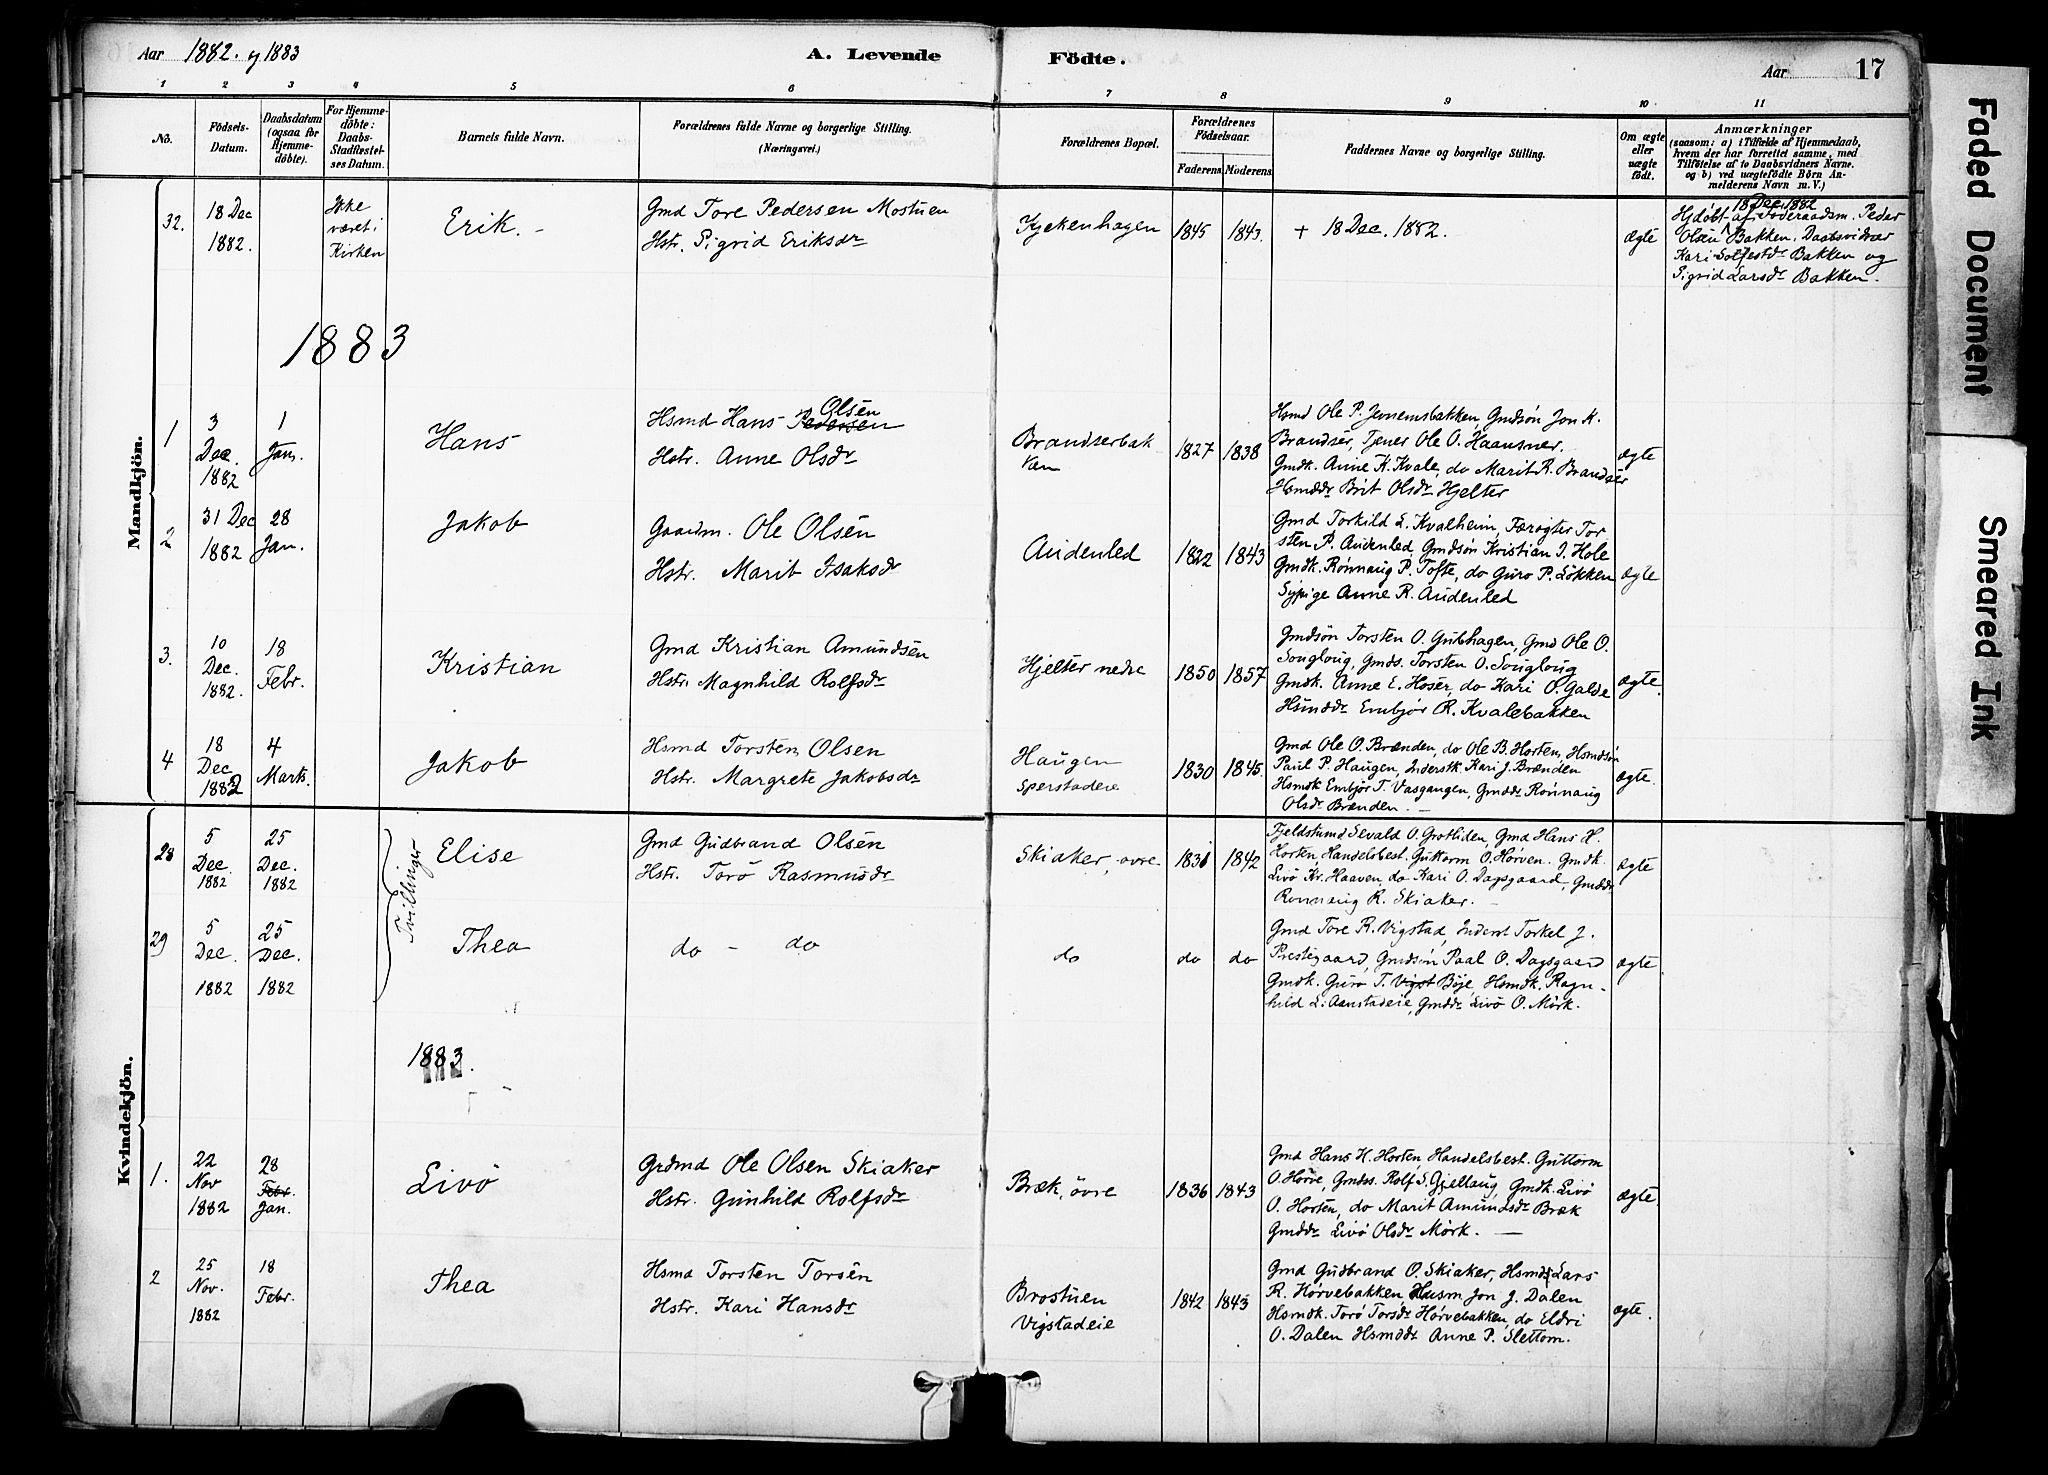 SAH, Skjåk prestekontor, Ministerialbok nr. 3, 1880-1907, s. 17